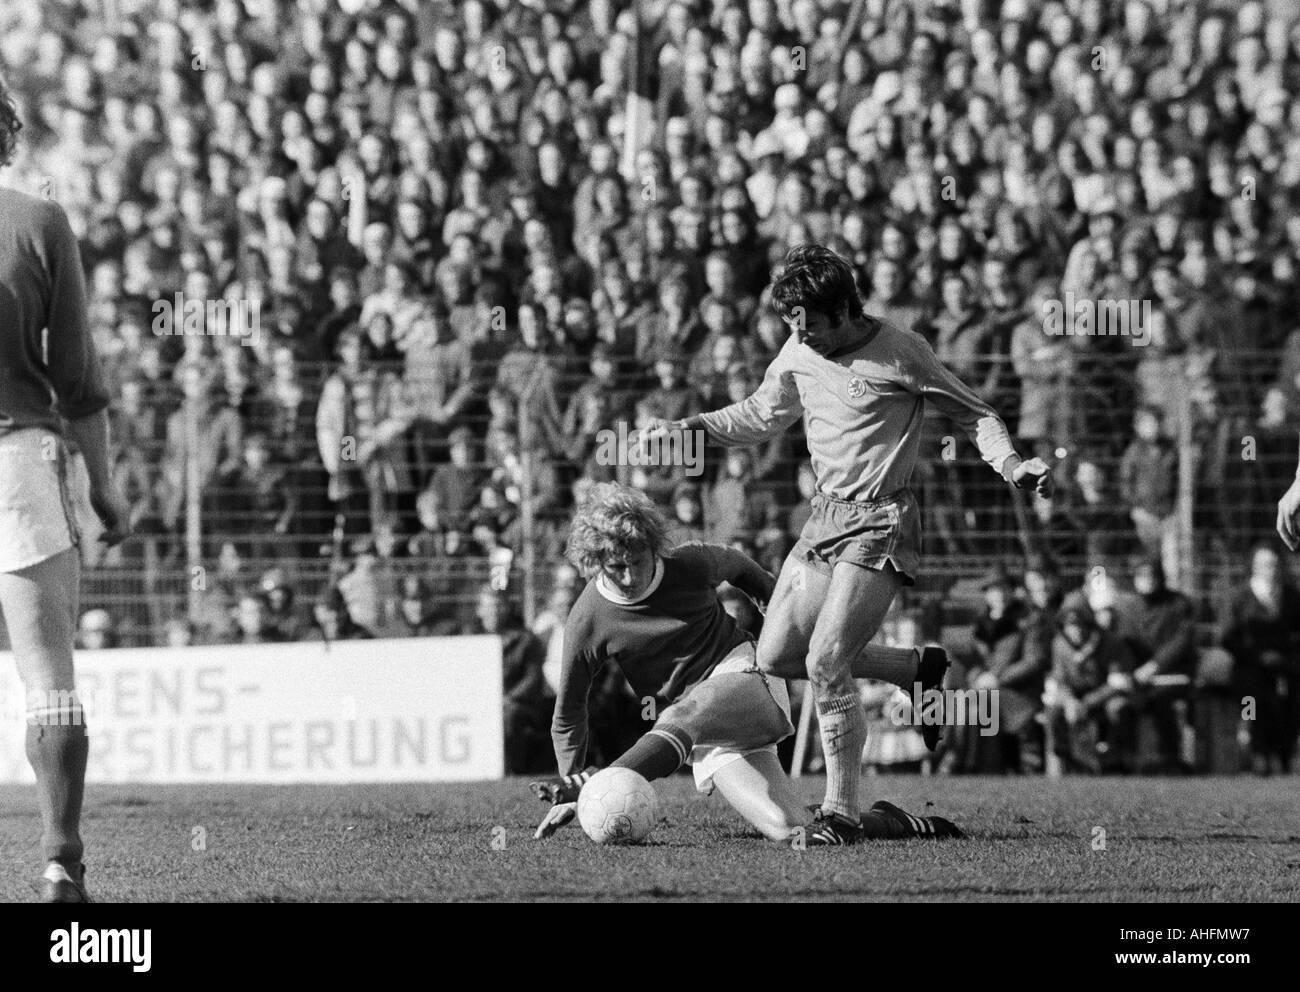 football, Bundesliga, 1971/1972, FC Schalke 04 versus Eintracht Brunswick 5:1, Glueckaufkampfbahn Stadium in Gelsenkirchen, scene of the match, duel between Klaus Fichtel (S04) left and Klaus Gerwin (BS) - Stock Image